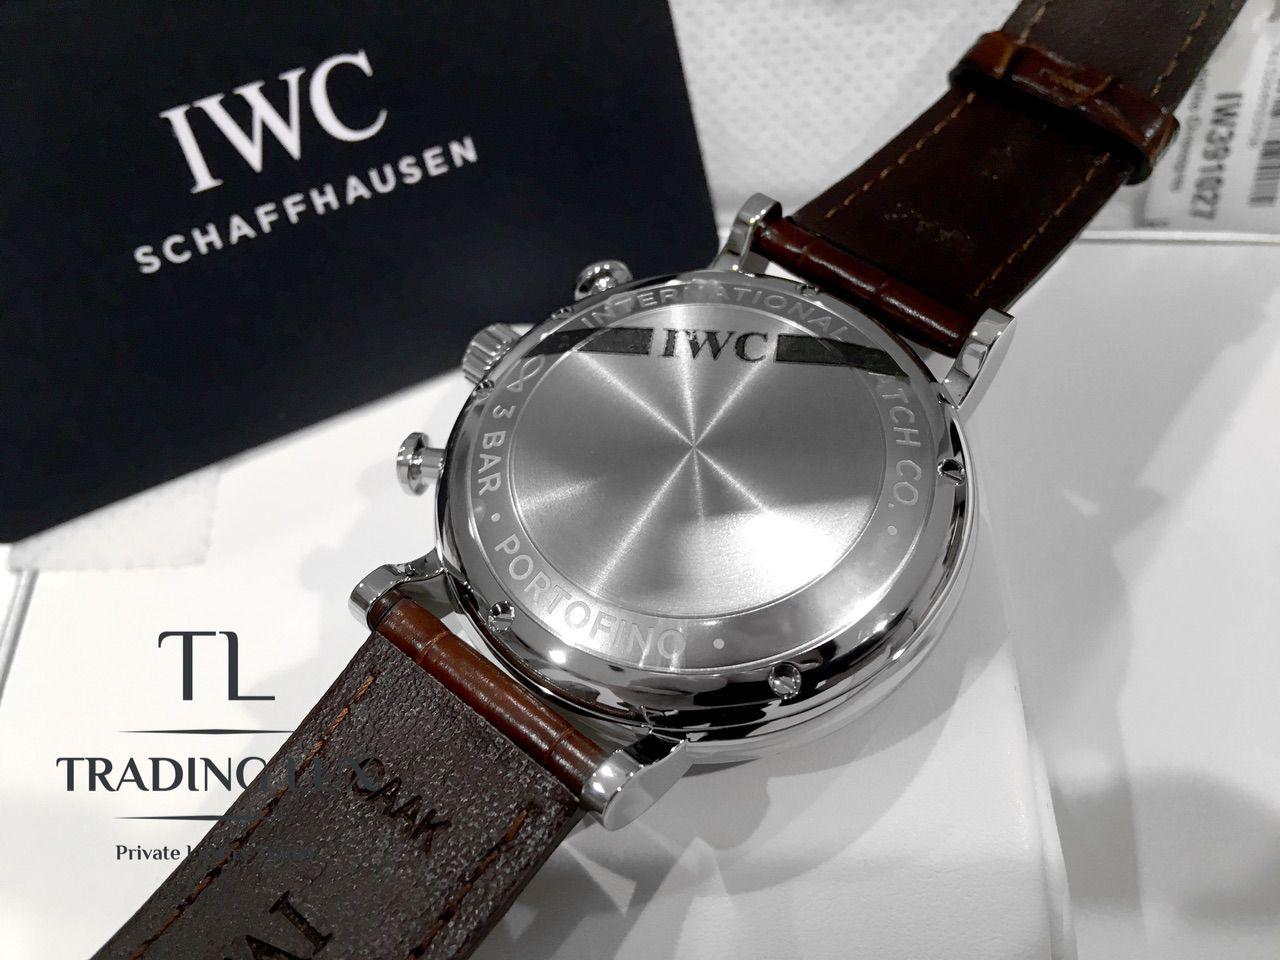 IWC-Portofino-IW391027-1